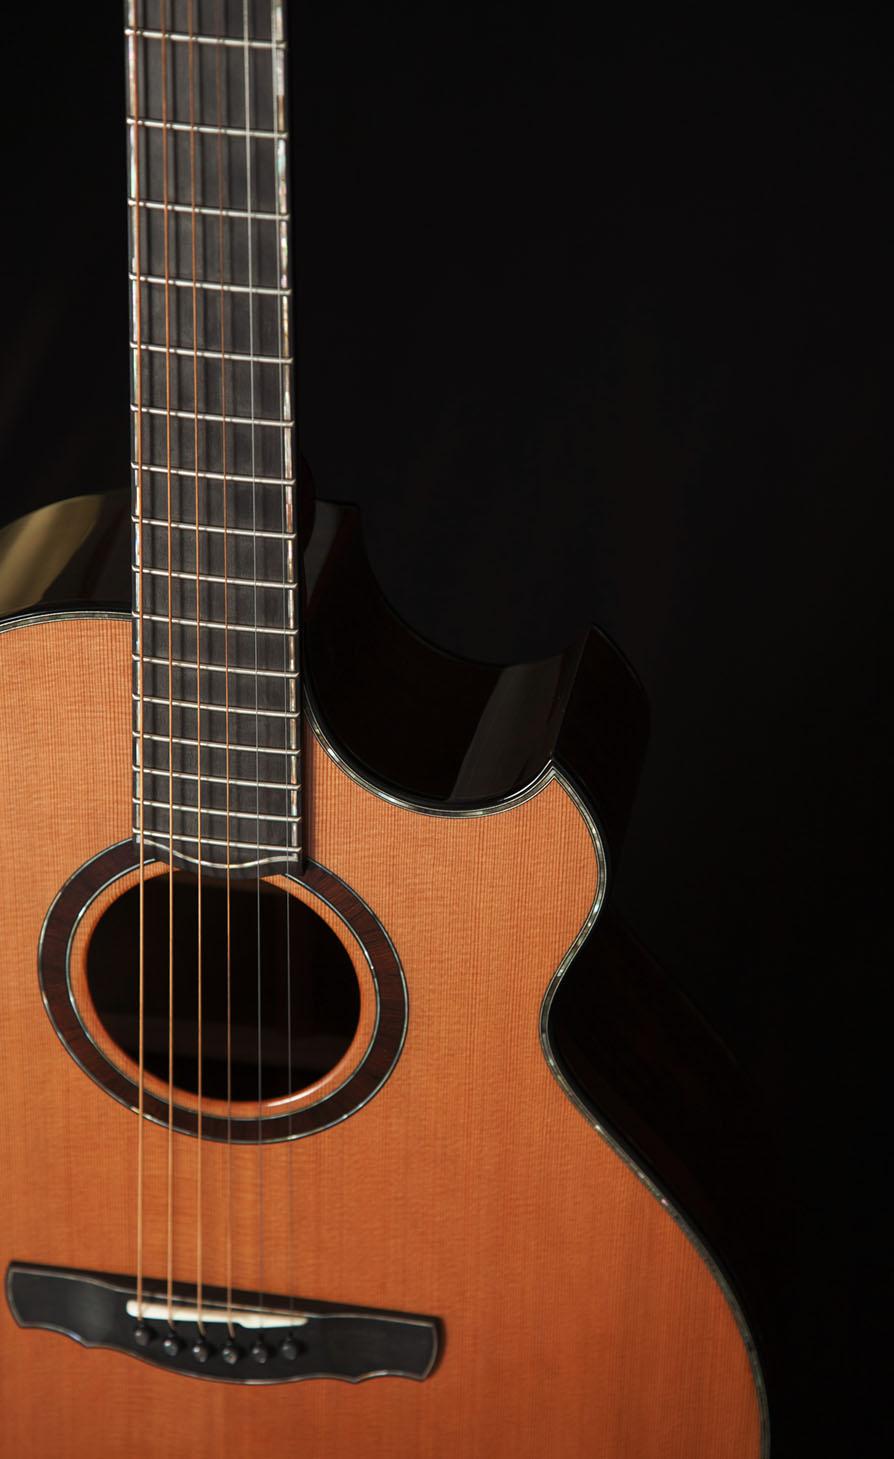 Black Pearl Soundboard Purfling